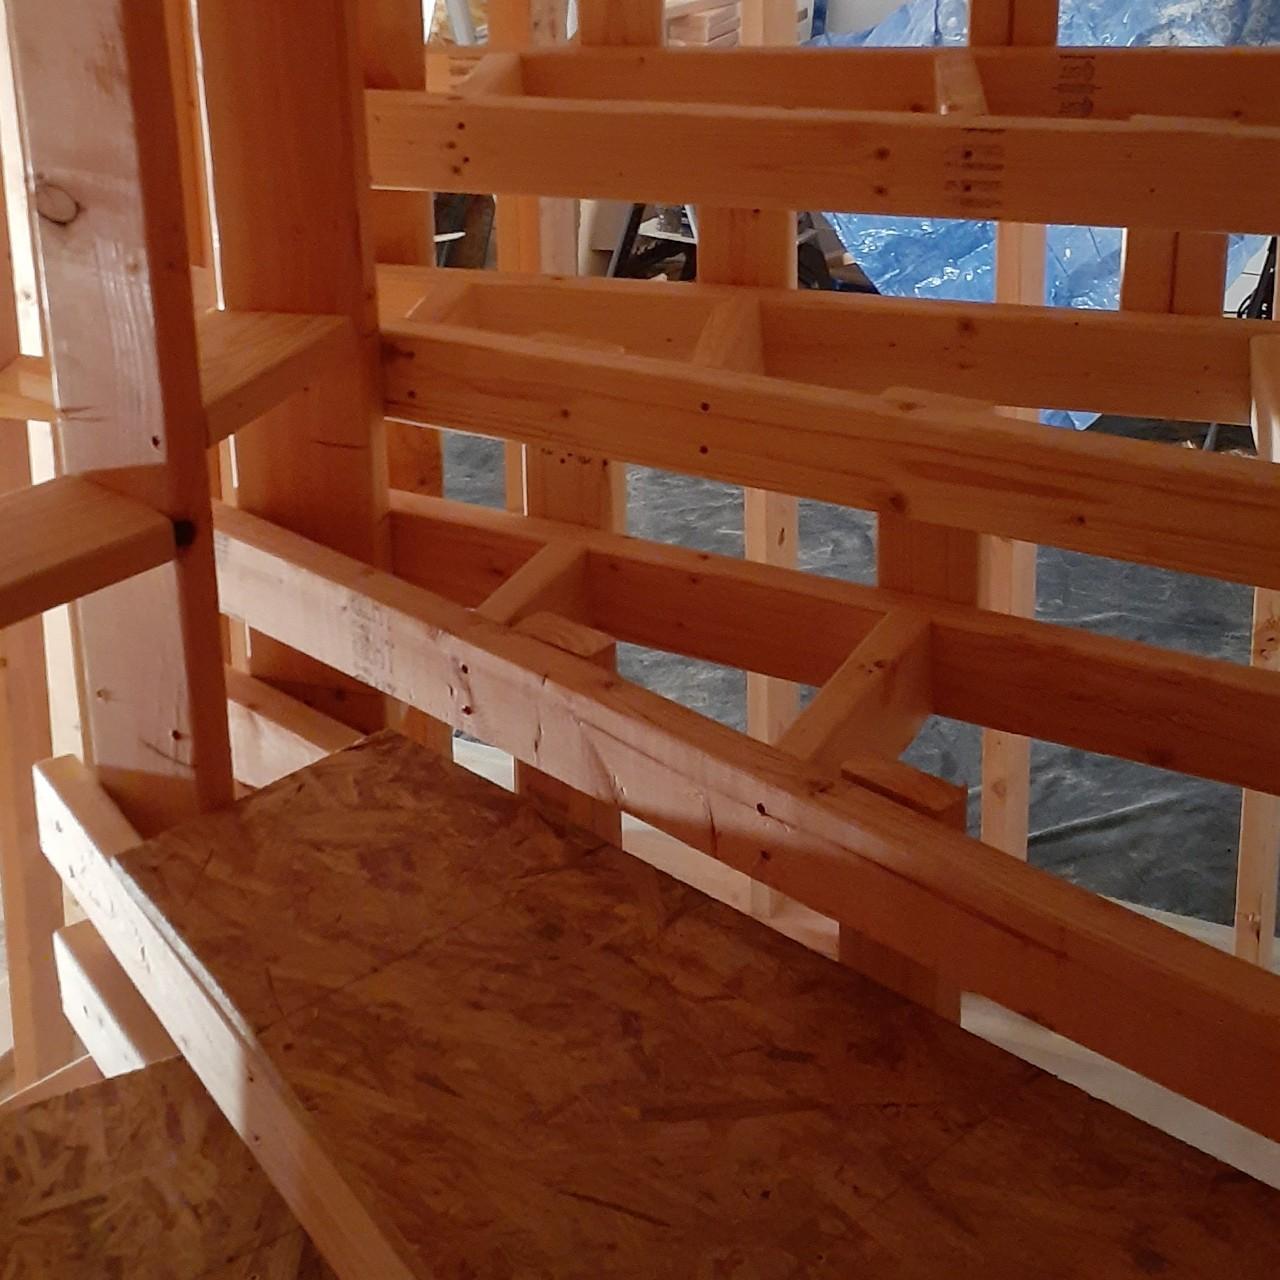 carpentry-wood-framing-second-floor-home-addition--framing-26